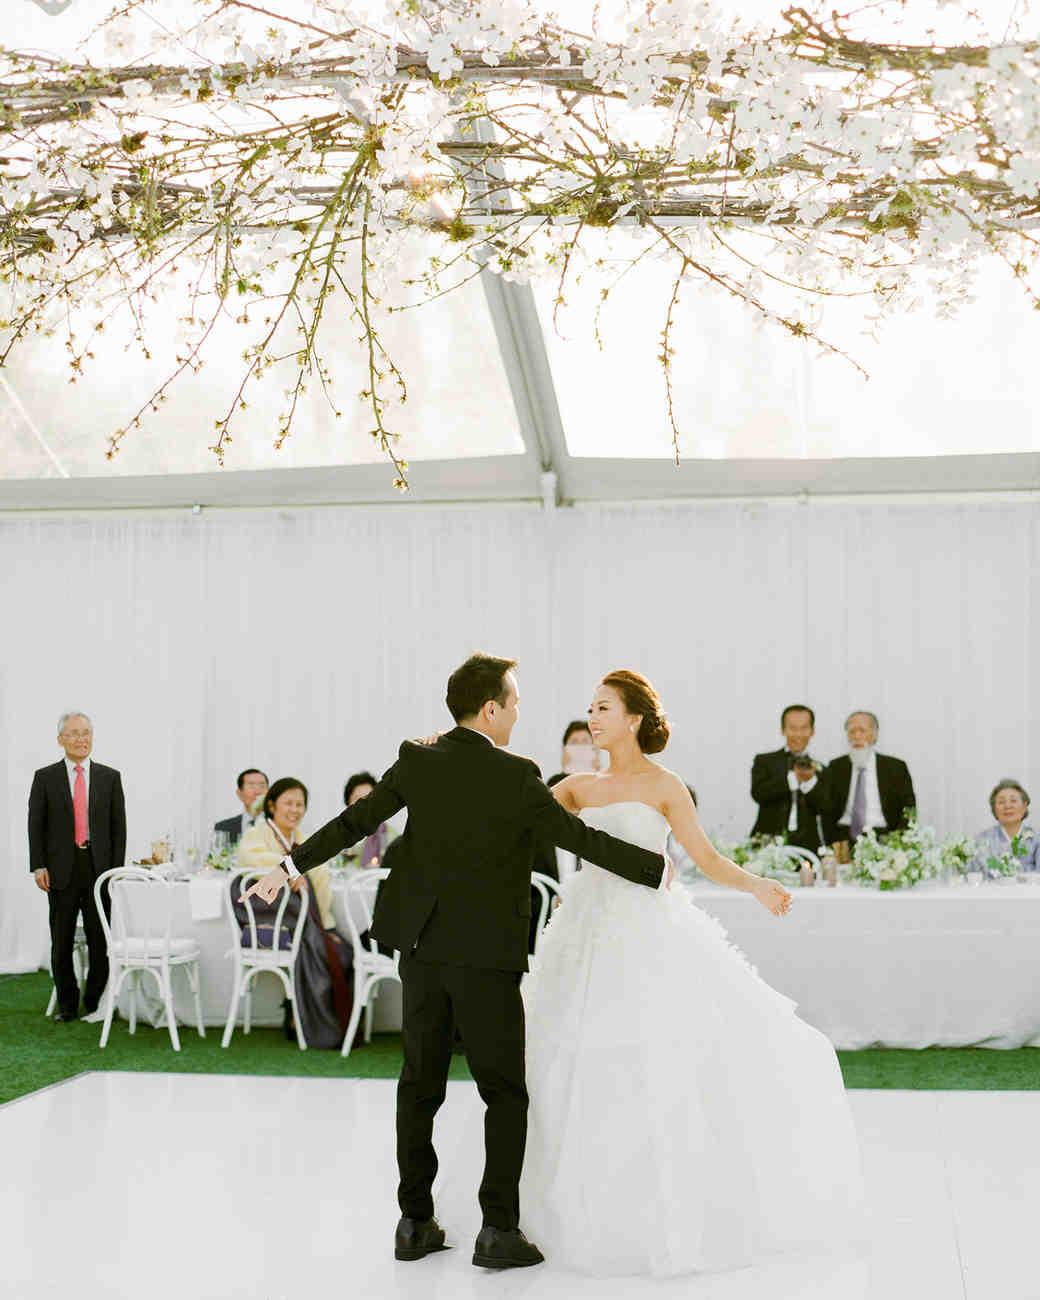 grace ceron wedding first dance bride groom